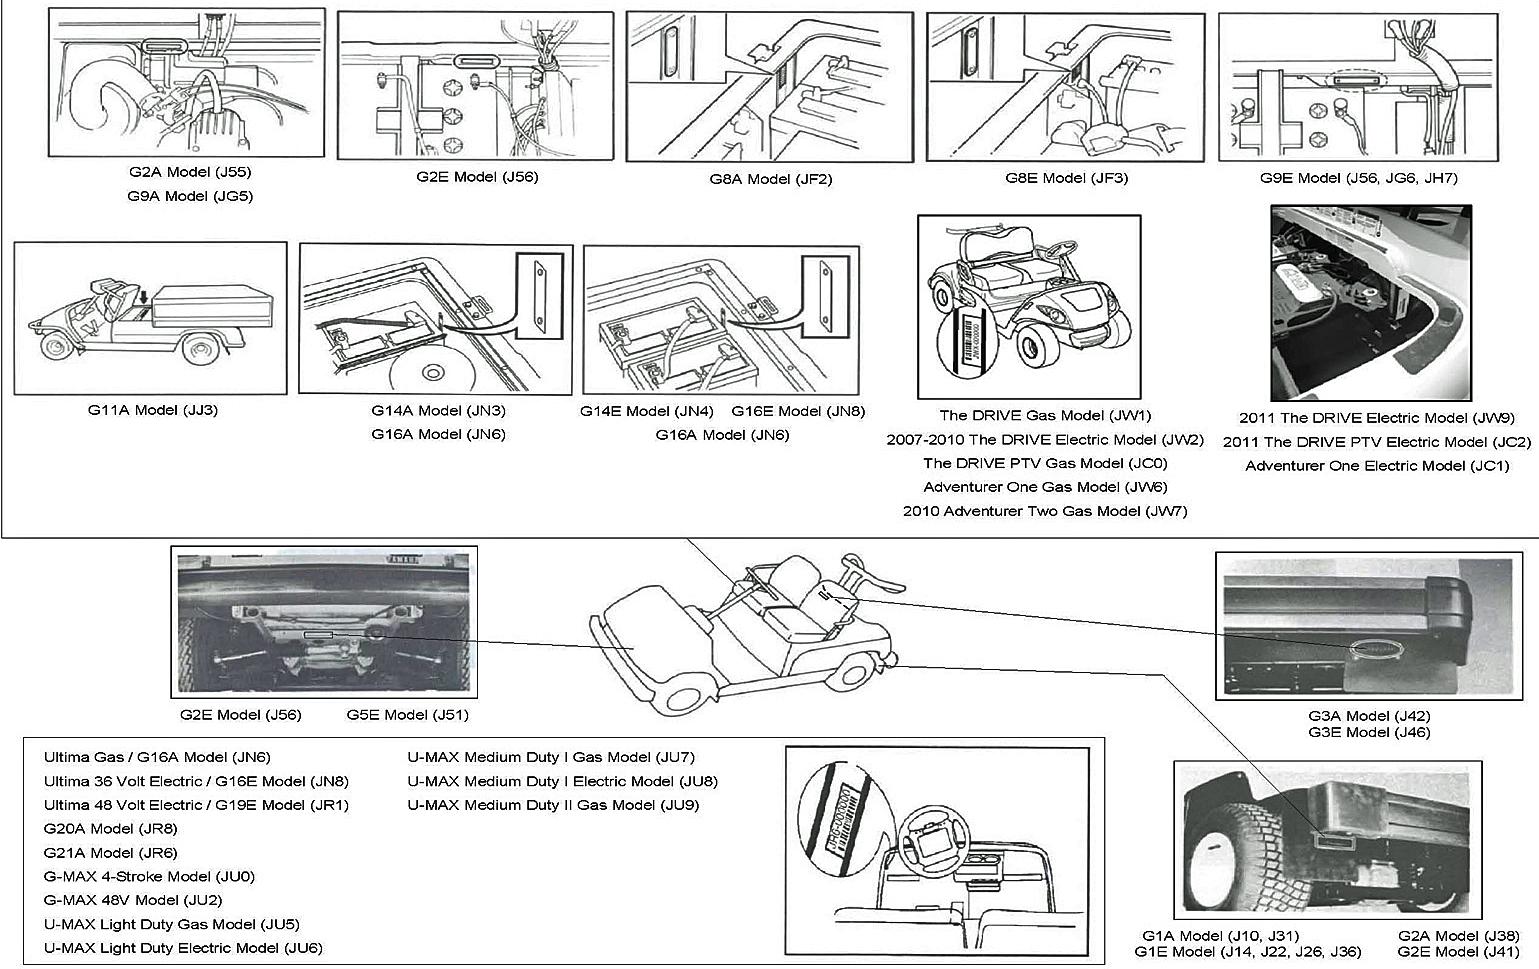 hight resolution of wiring diagram for hyundai golf cart wiring schematic diagramhyundai golf cart 36 volt wiring diagrams wiring